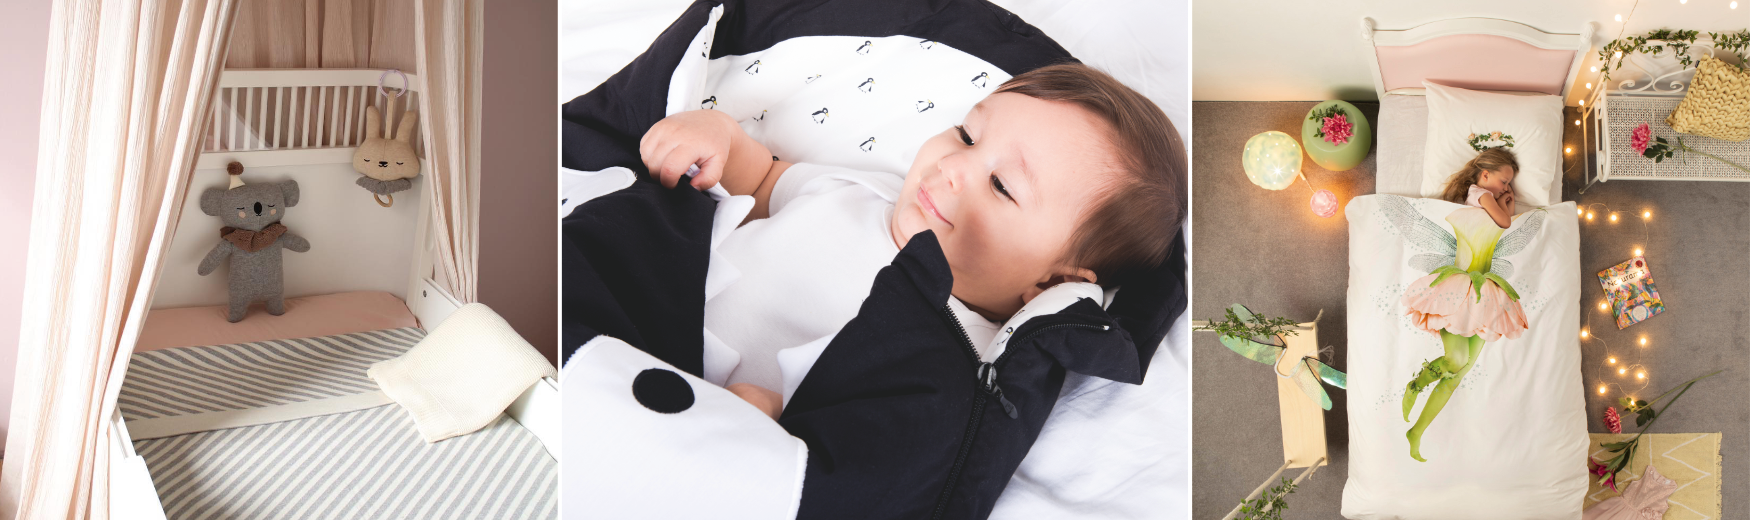 Sleep & Dream | Design Stuff for Kids